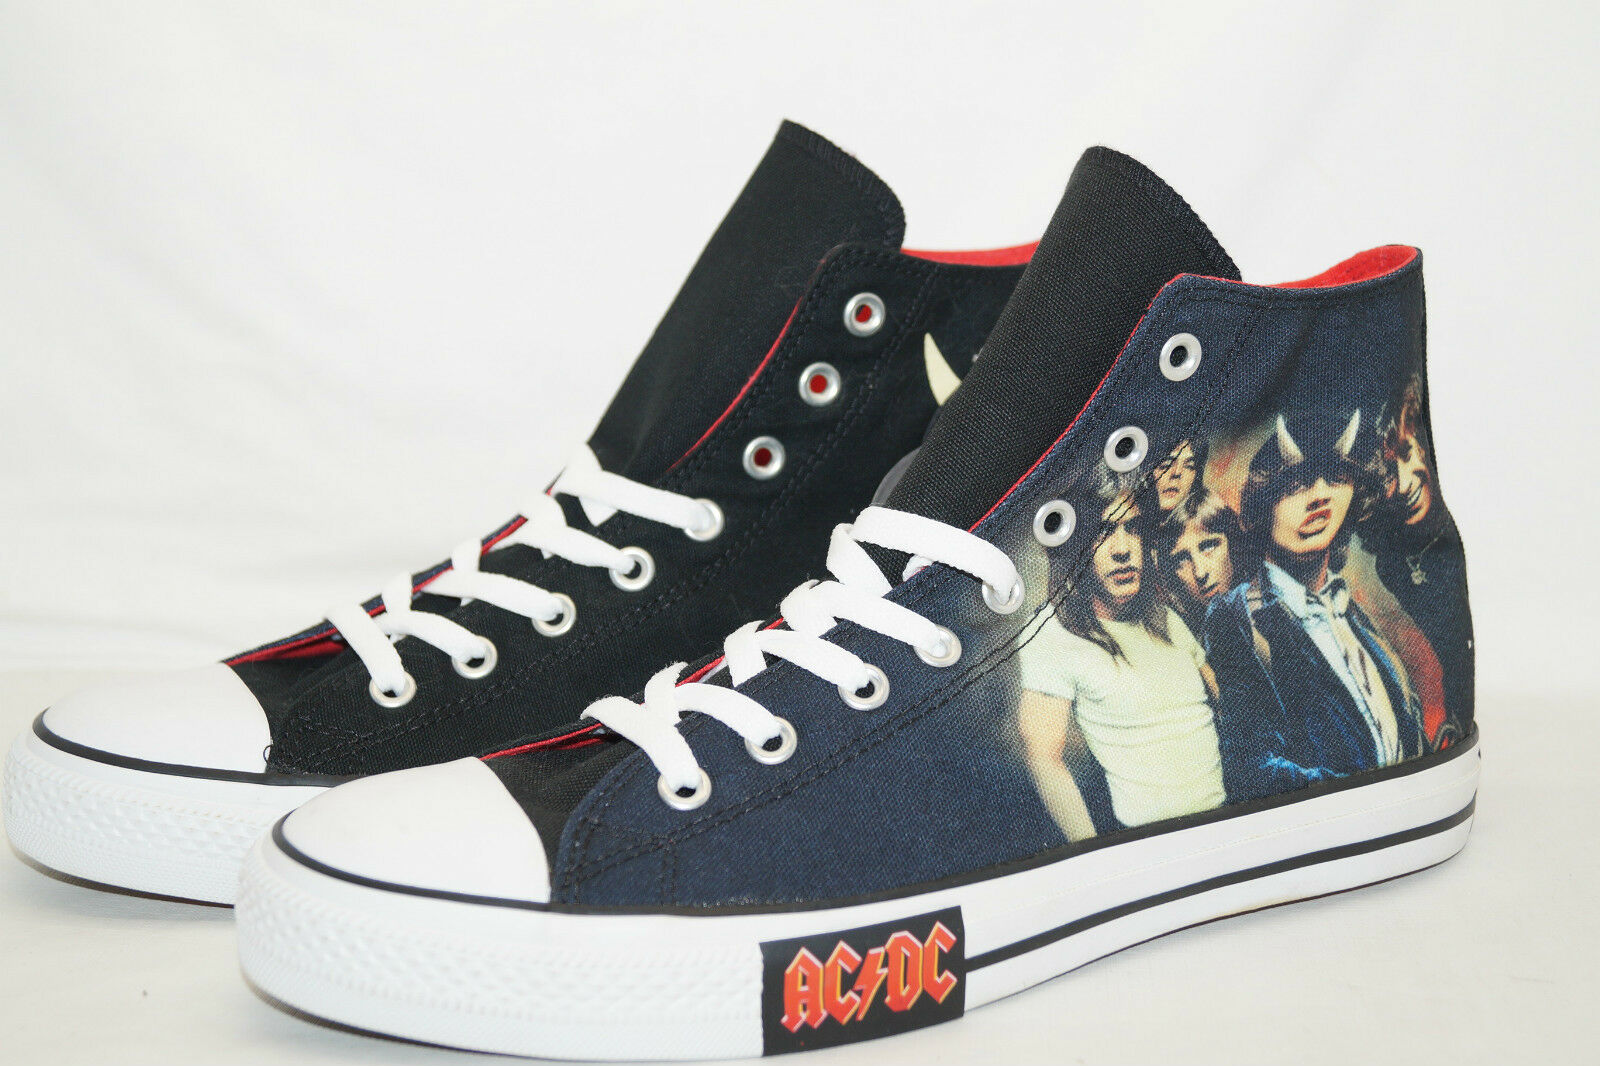 Converse Chucks All Star Star Star High TG 45 AC DC Highway To Hell 111073 di 2008 3813af